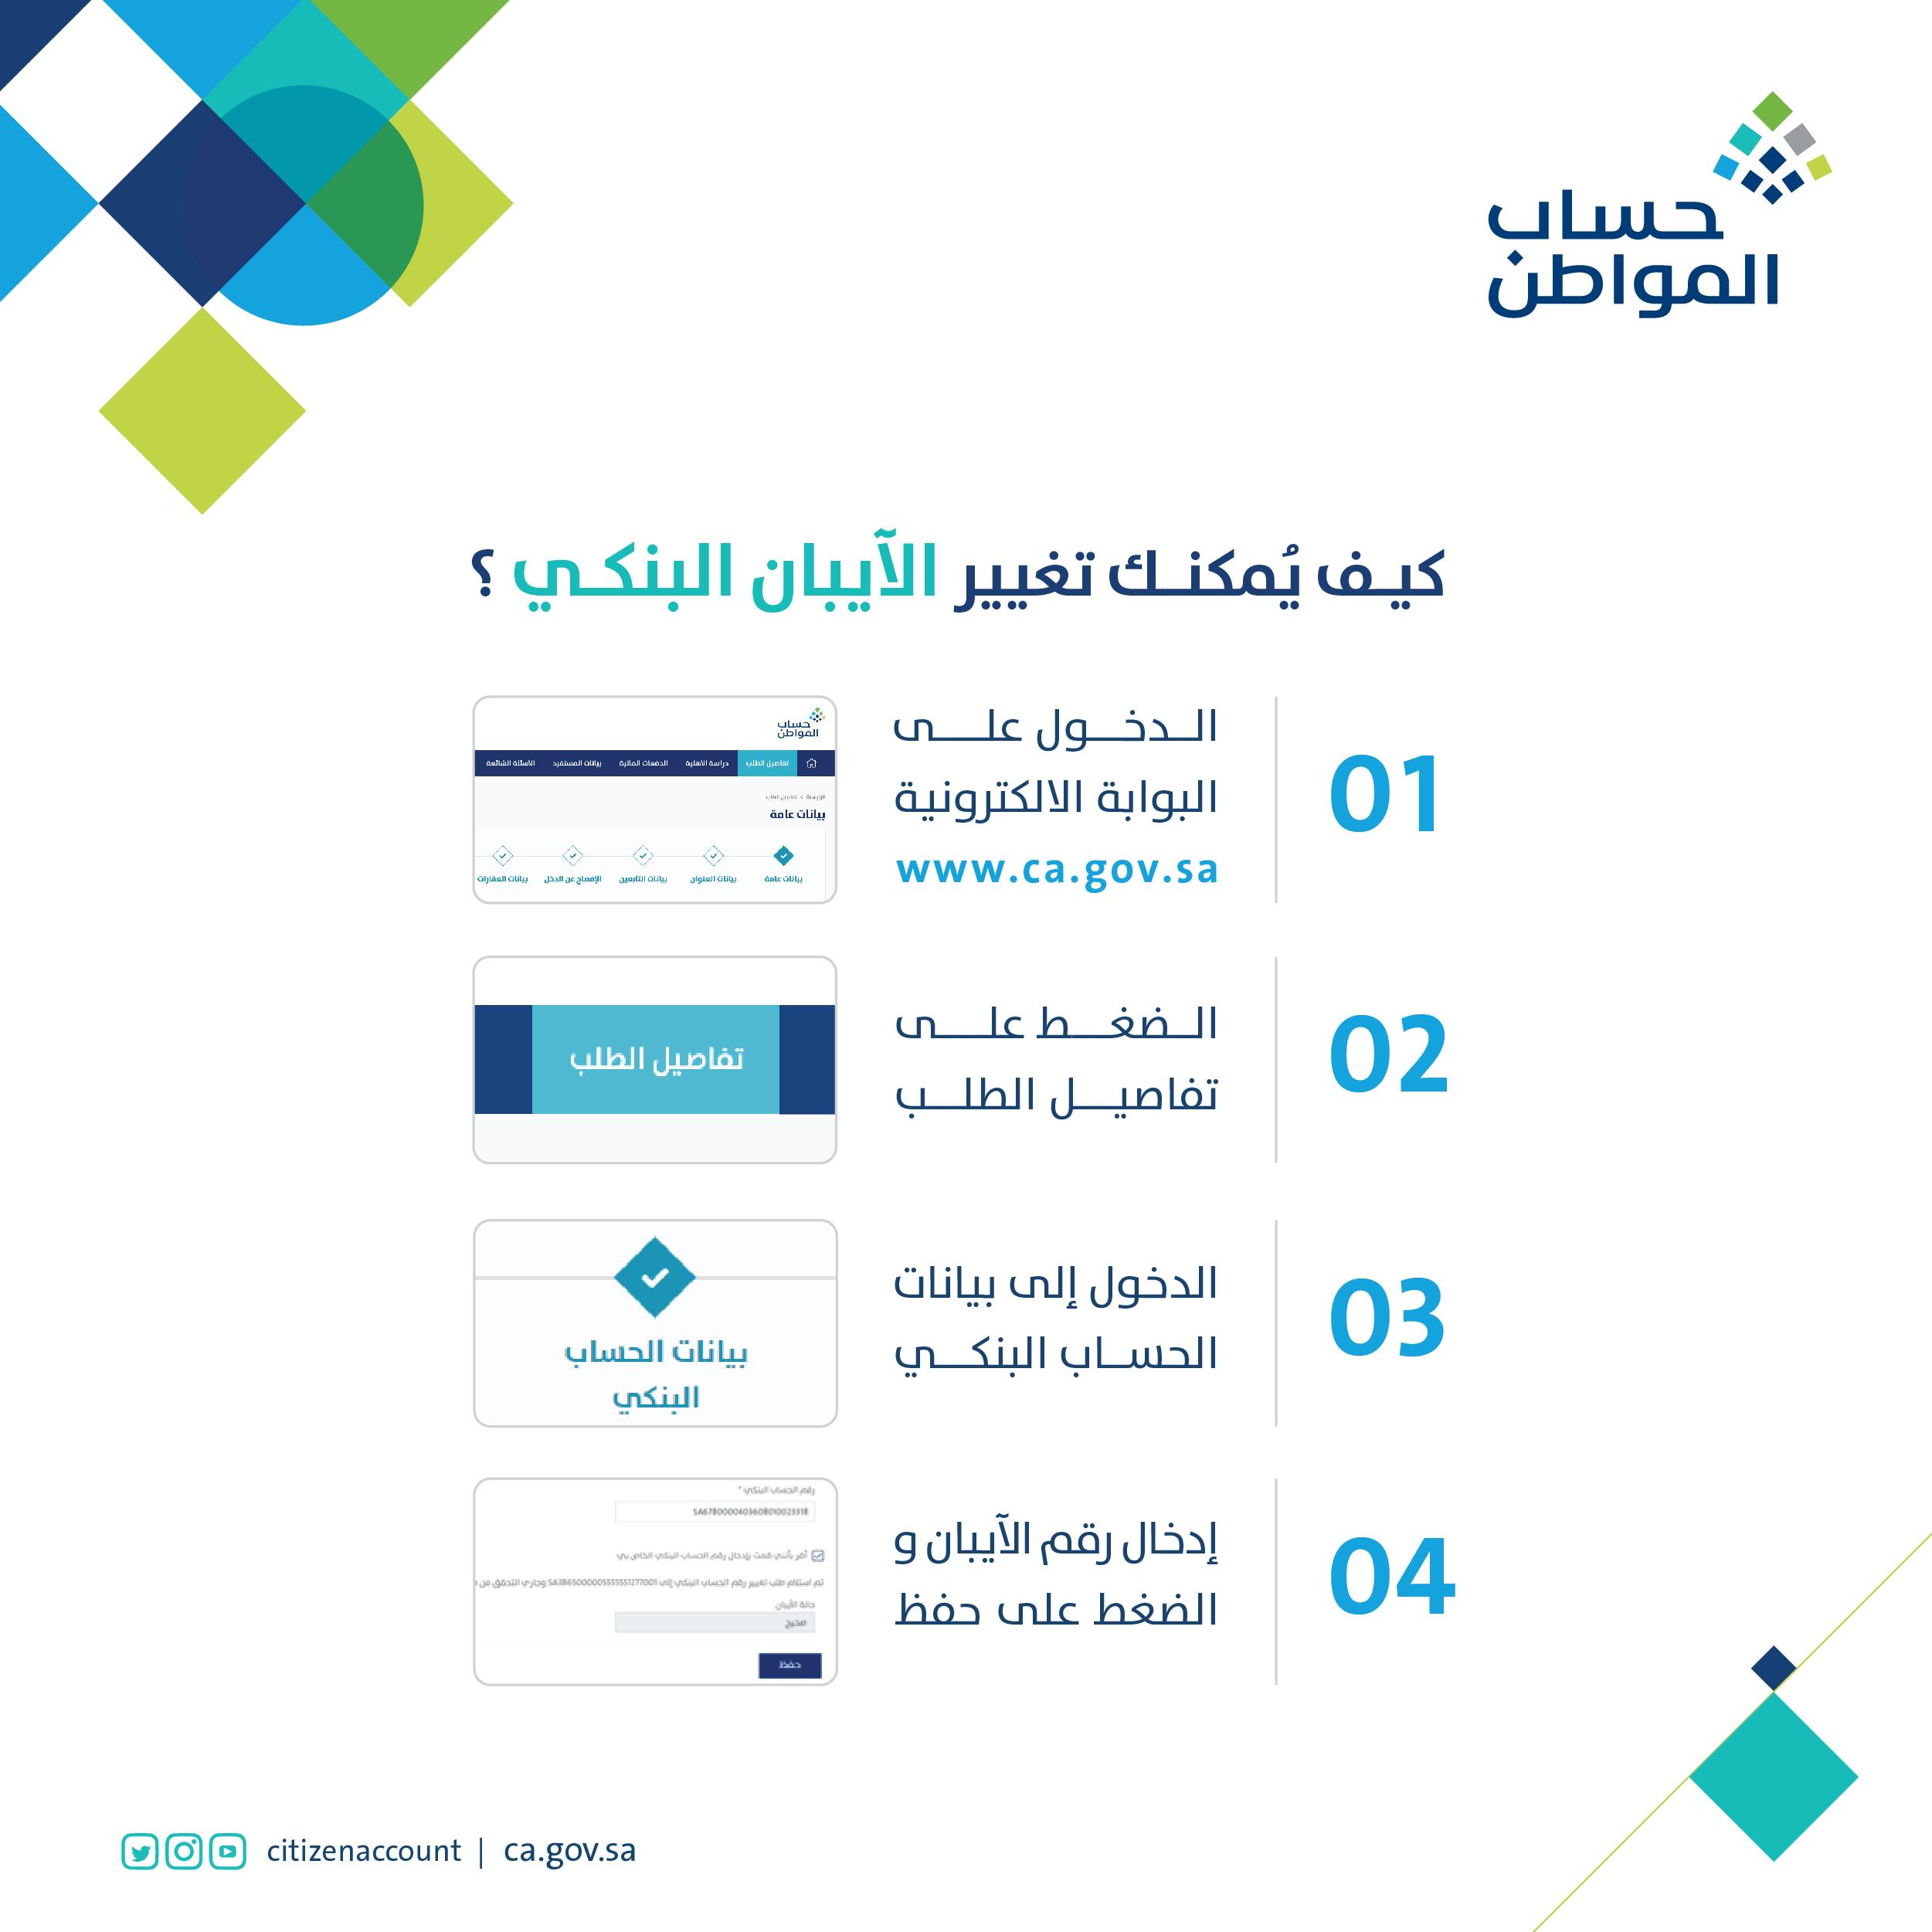 EgbnR20UYAAmIqR?format=jpg&name=4096x4096 - شرح طريقة تغيير الآيبان البنكي في برنامج حساب المواطن